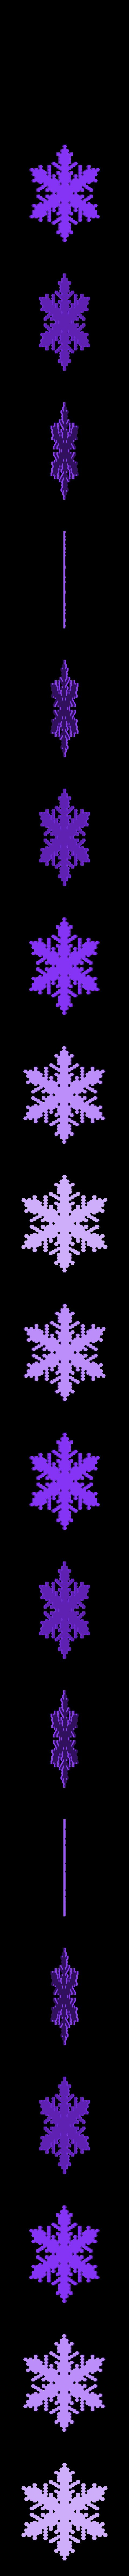 reiter30-0.5-0.7-0.003-150.stl Download free STL file Snowflake growth simulation in BlocksCAD • 3D printing design, arpruss